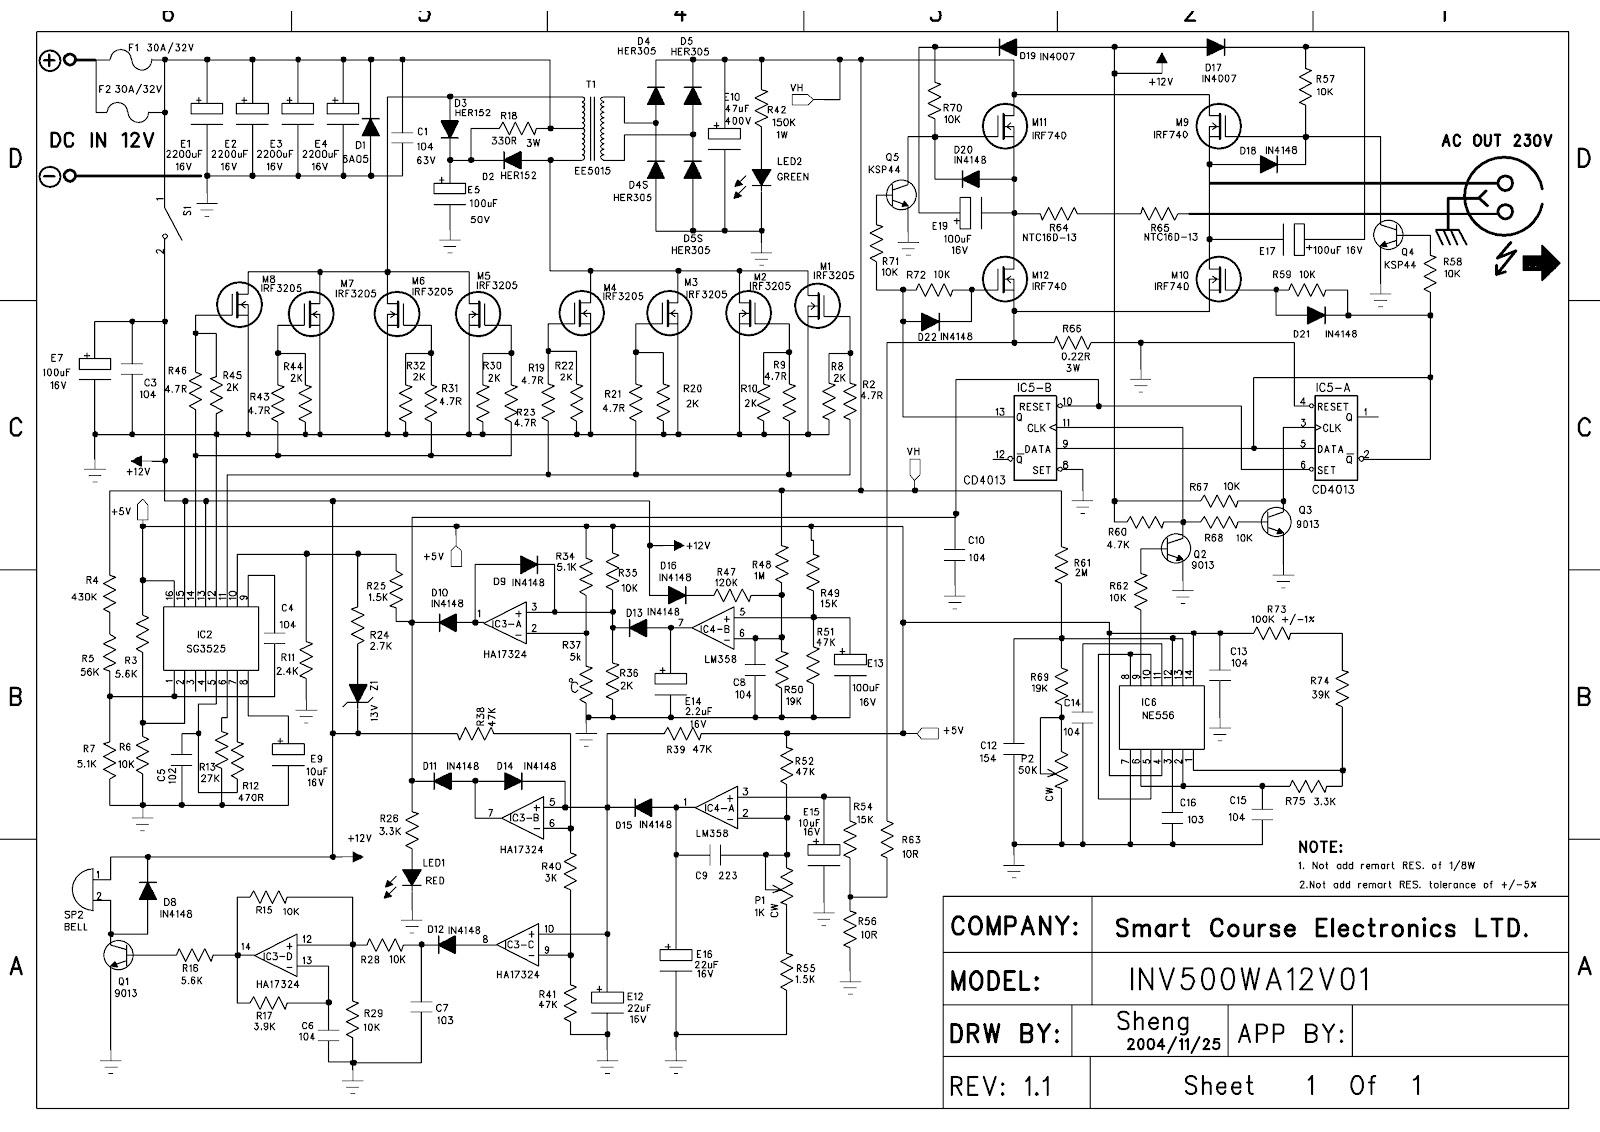 Hallicrafters Schematic S W 500 Best Secret Wiring Diagram Smps Inverter Circuit Switching 500w Sw Revolver